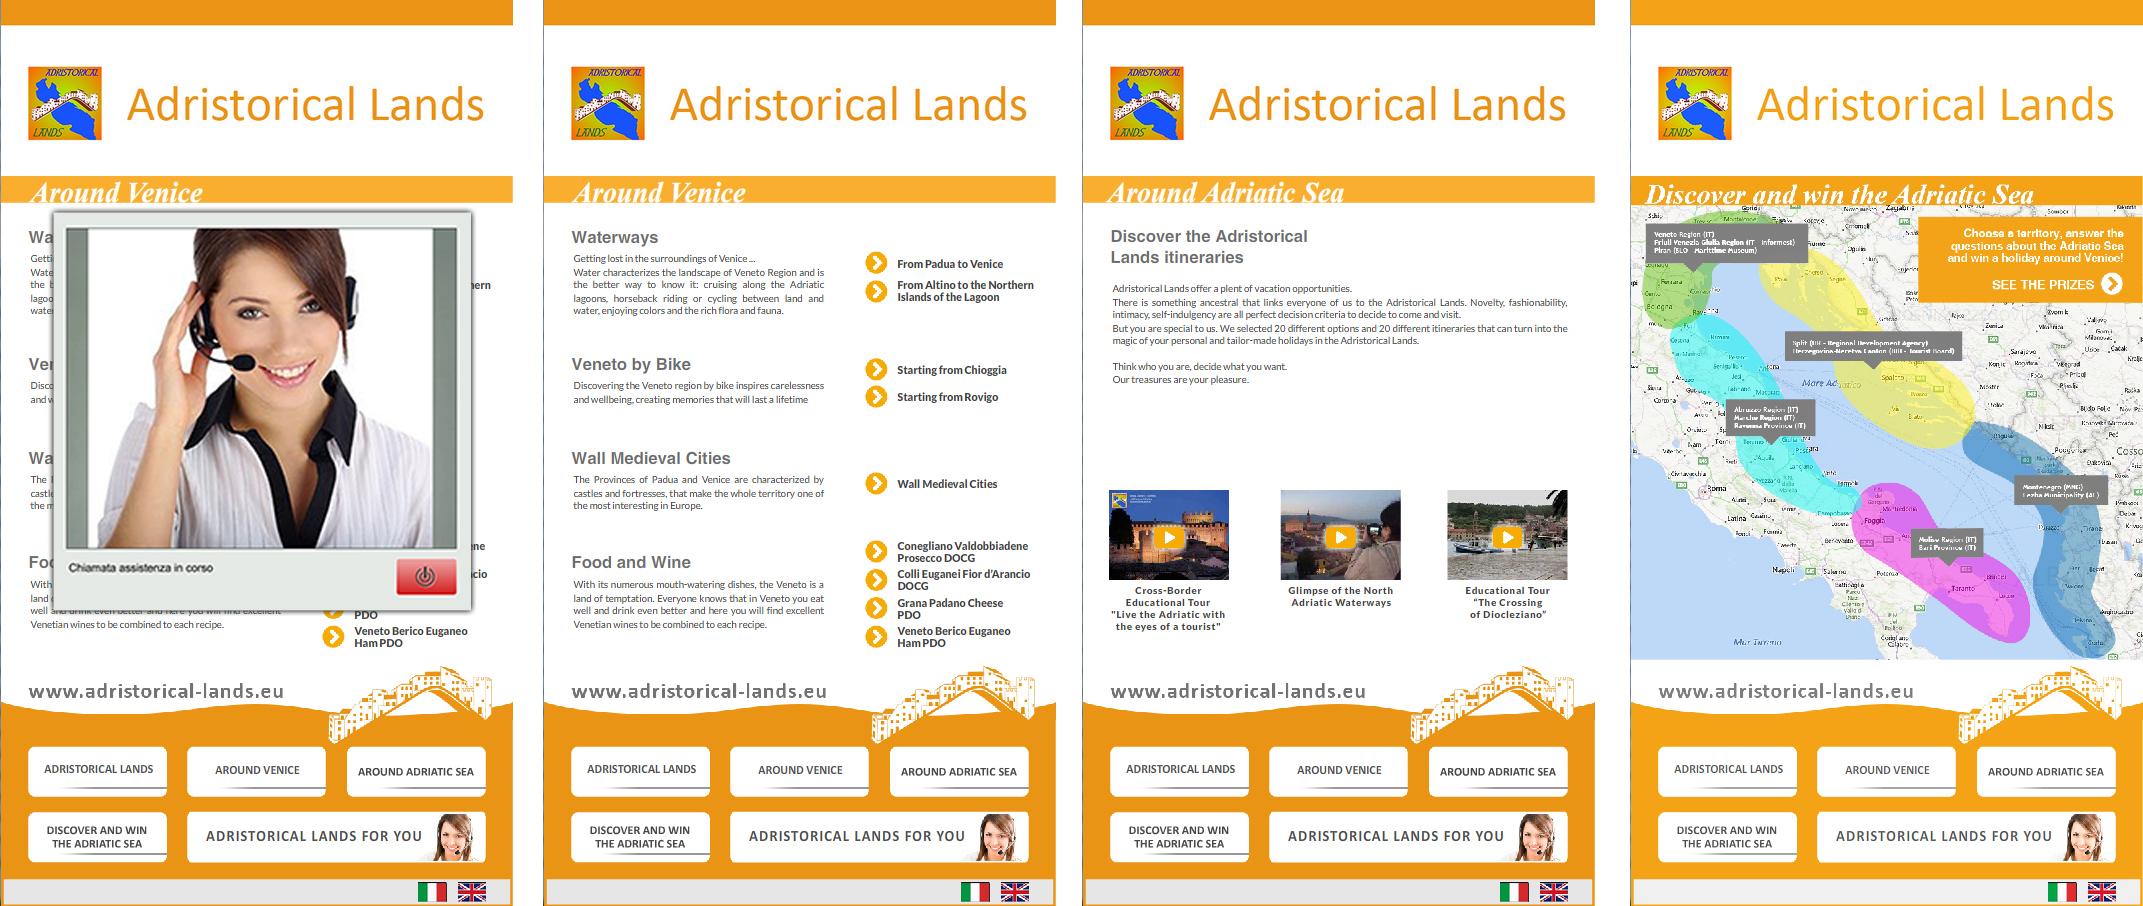 video contact center per adristorical lands